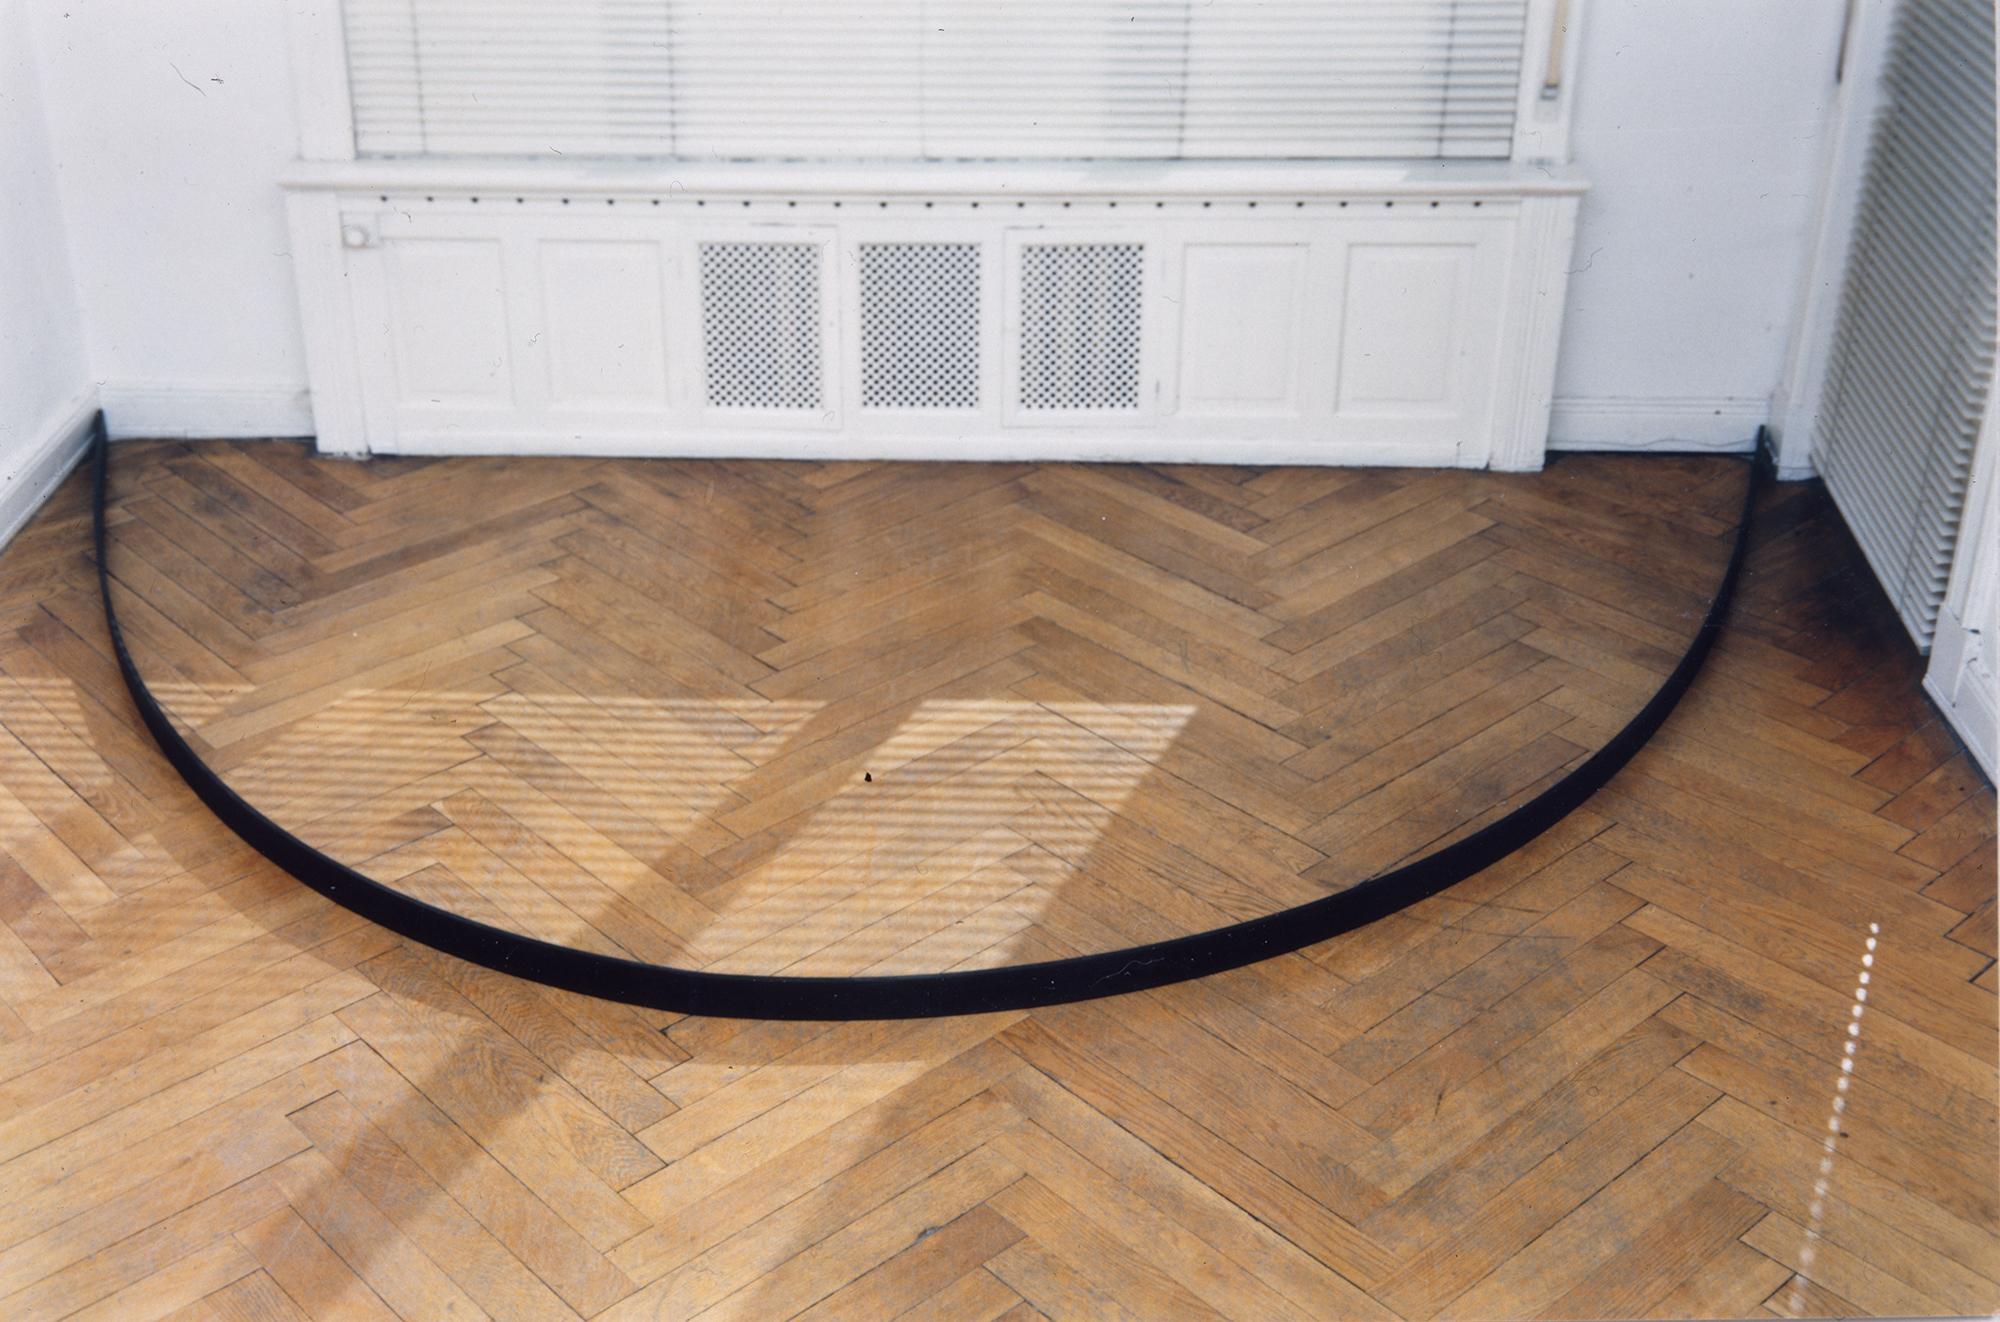 David Row - Untitled Arc